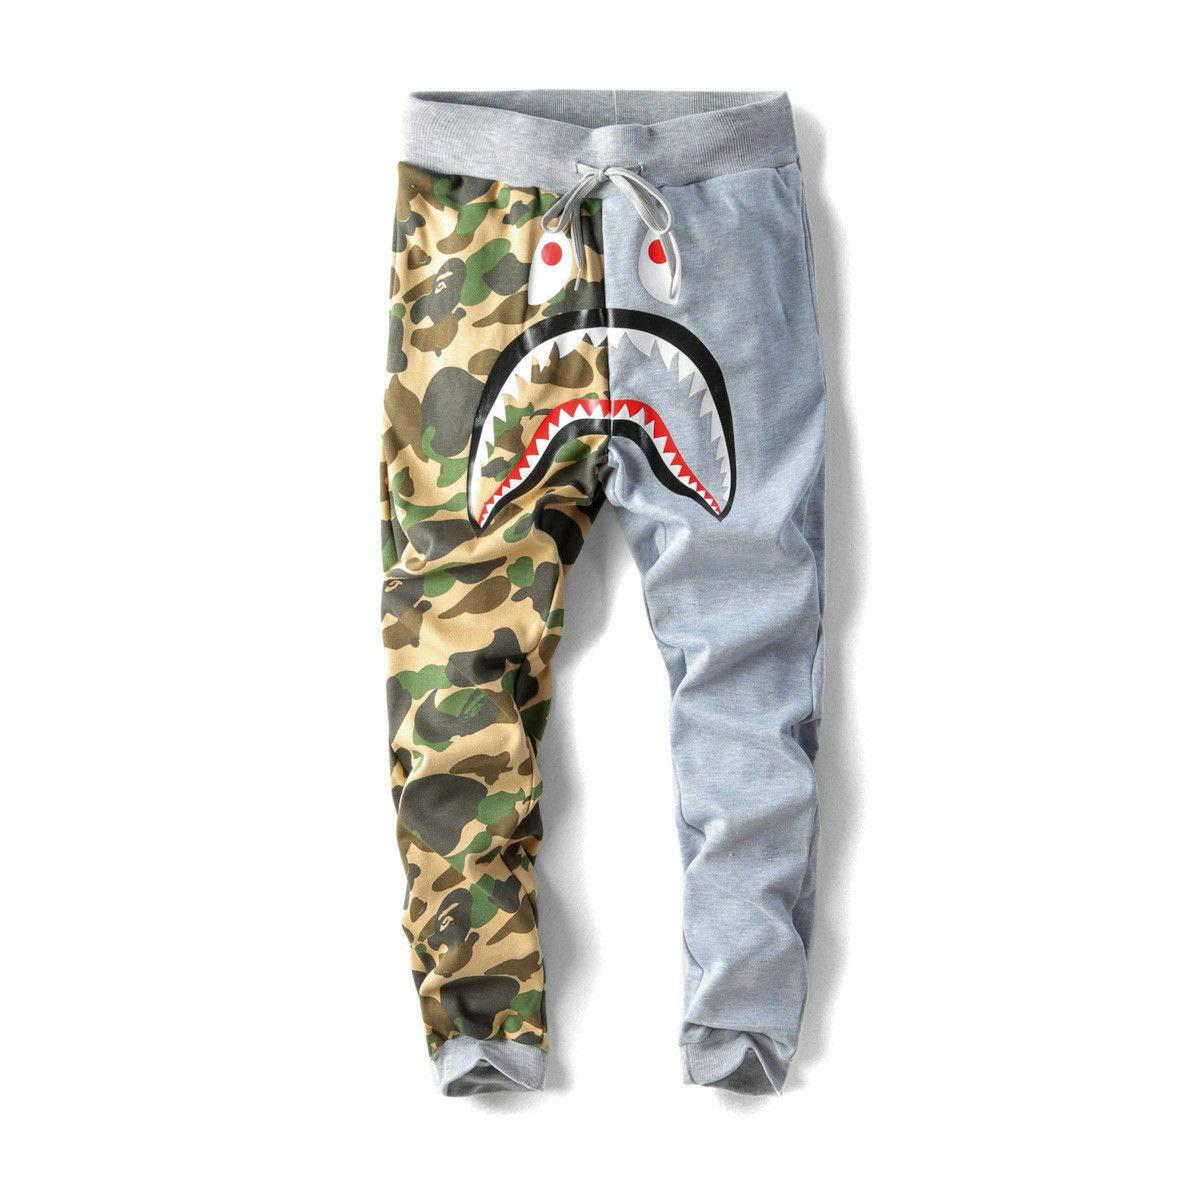 BAPE Shark Head Camouflage Sweatpants and Men/'s Bathing Ape Pants Casual Pants